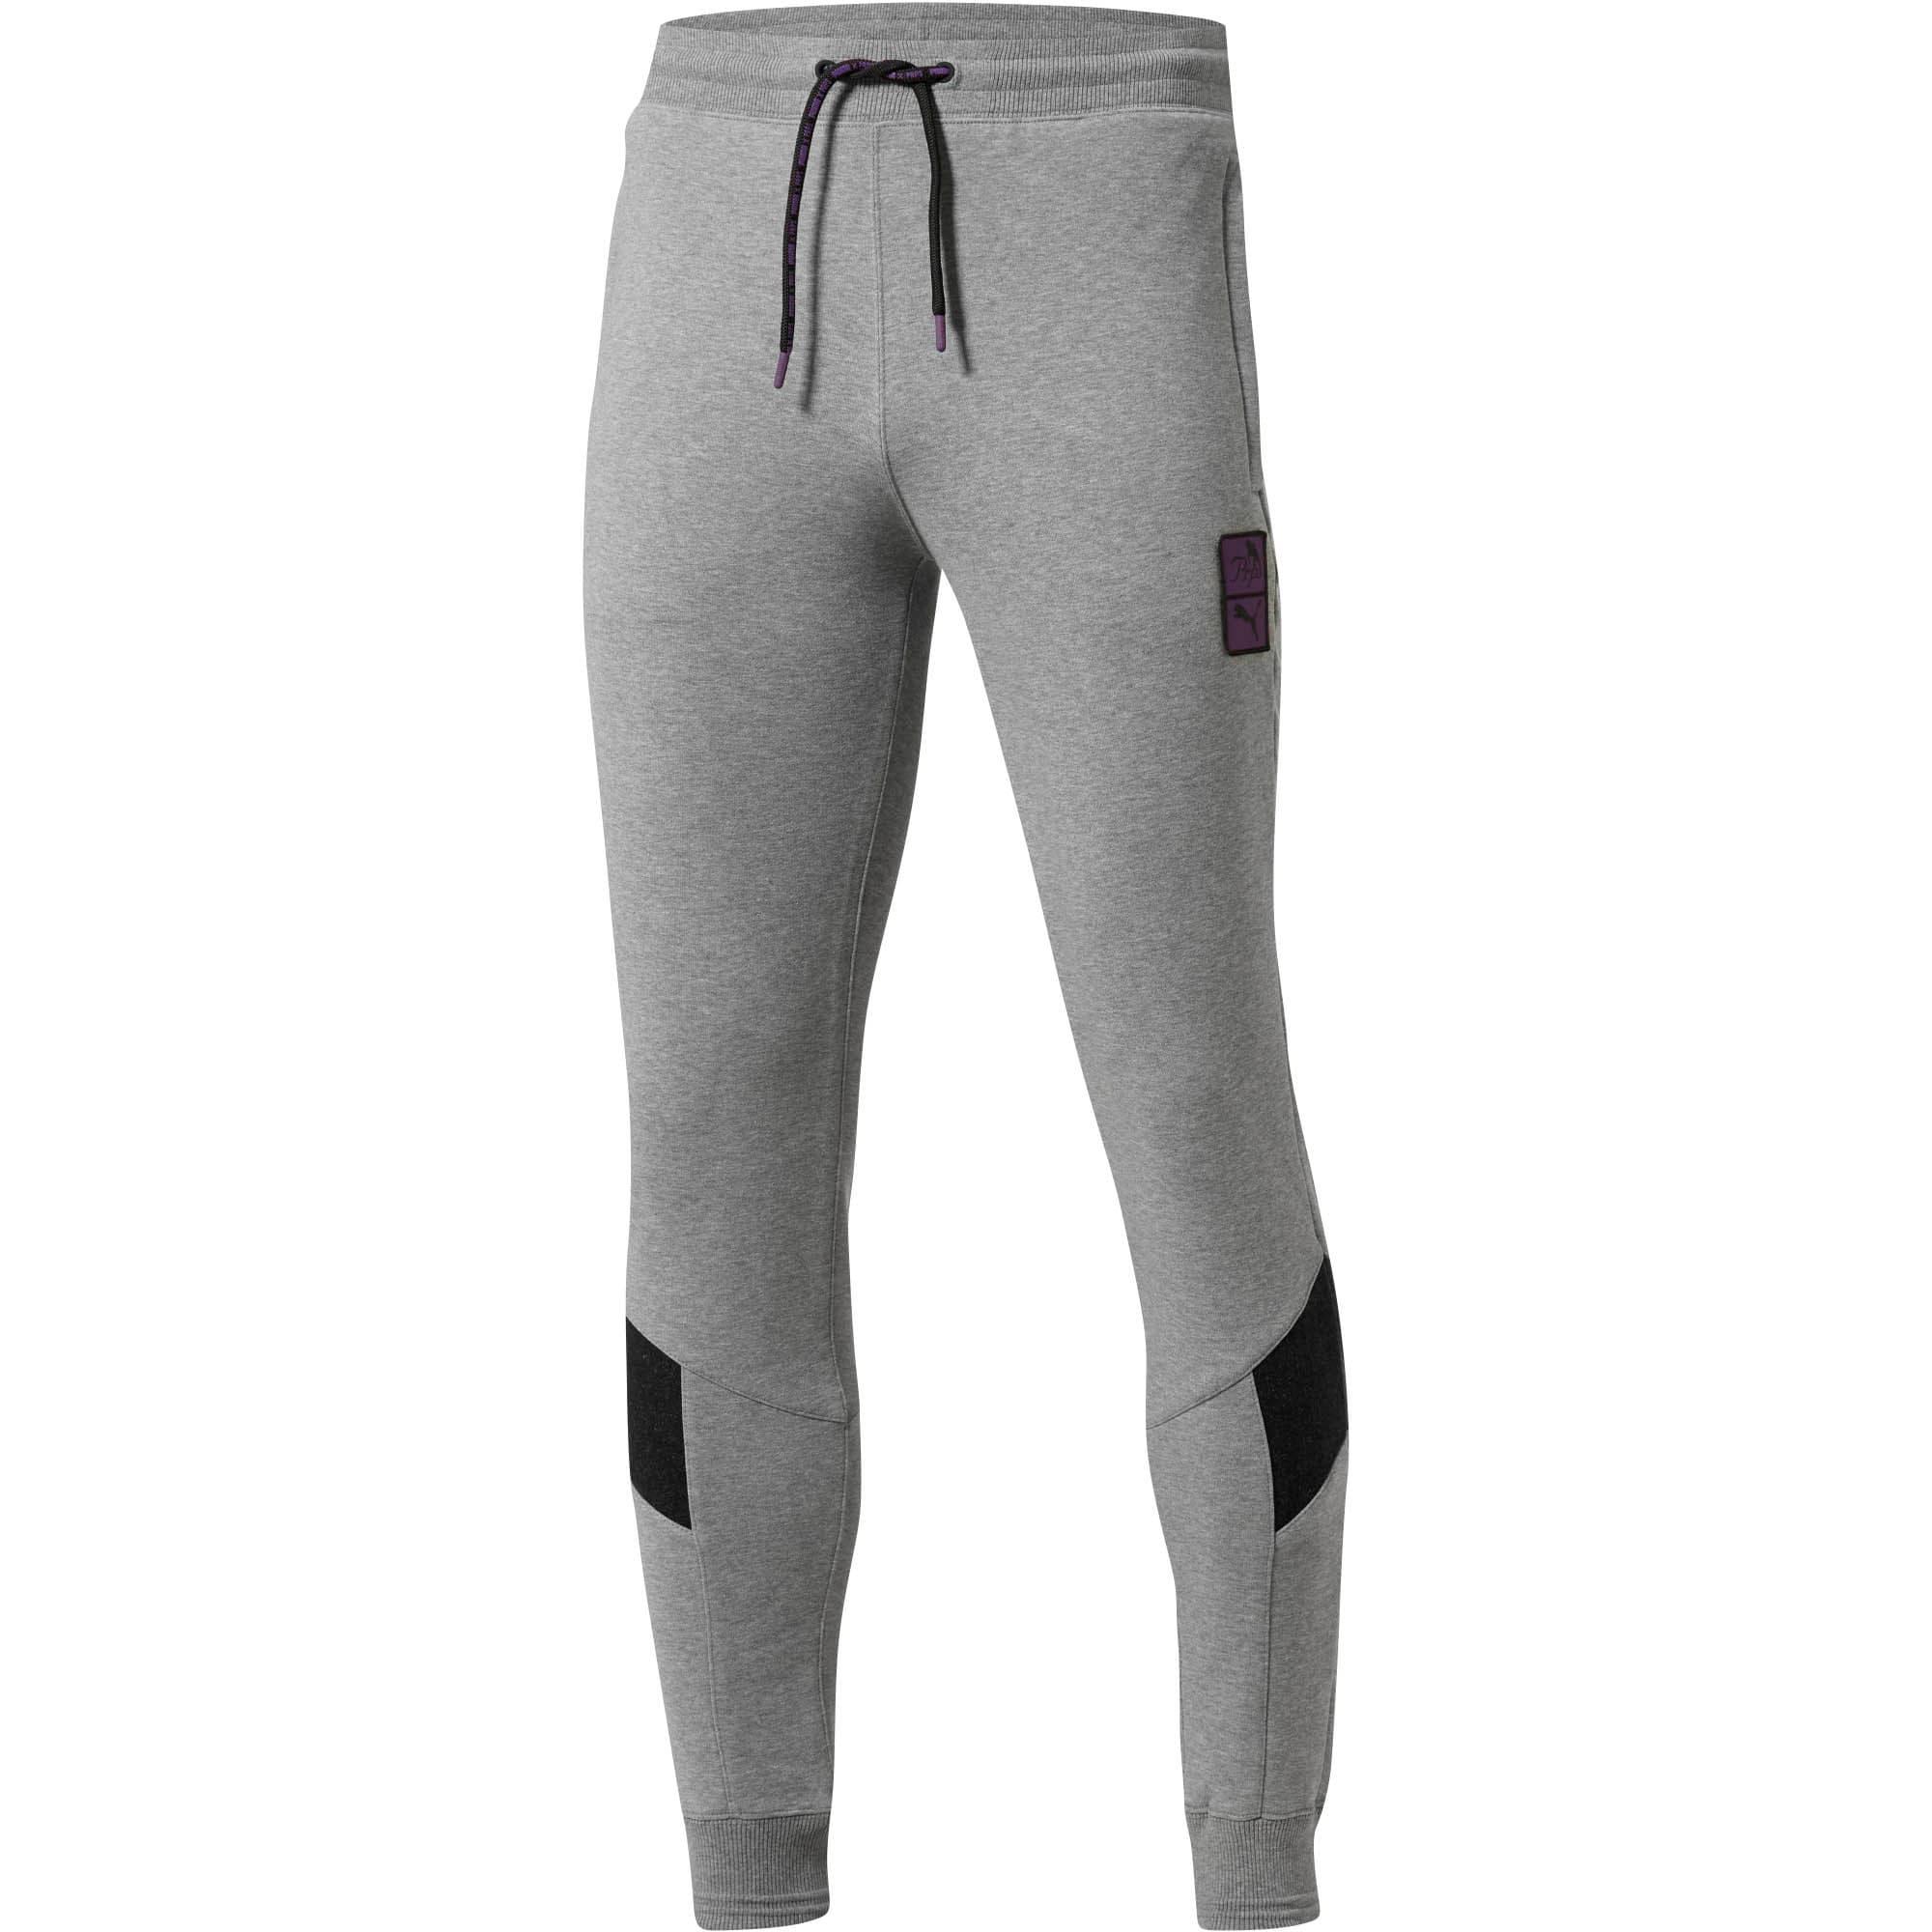 Thumbnail 1 of PUMA x PRPS Men's Overlay Pants, MGH-Puma Black, medium